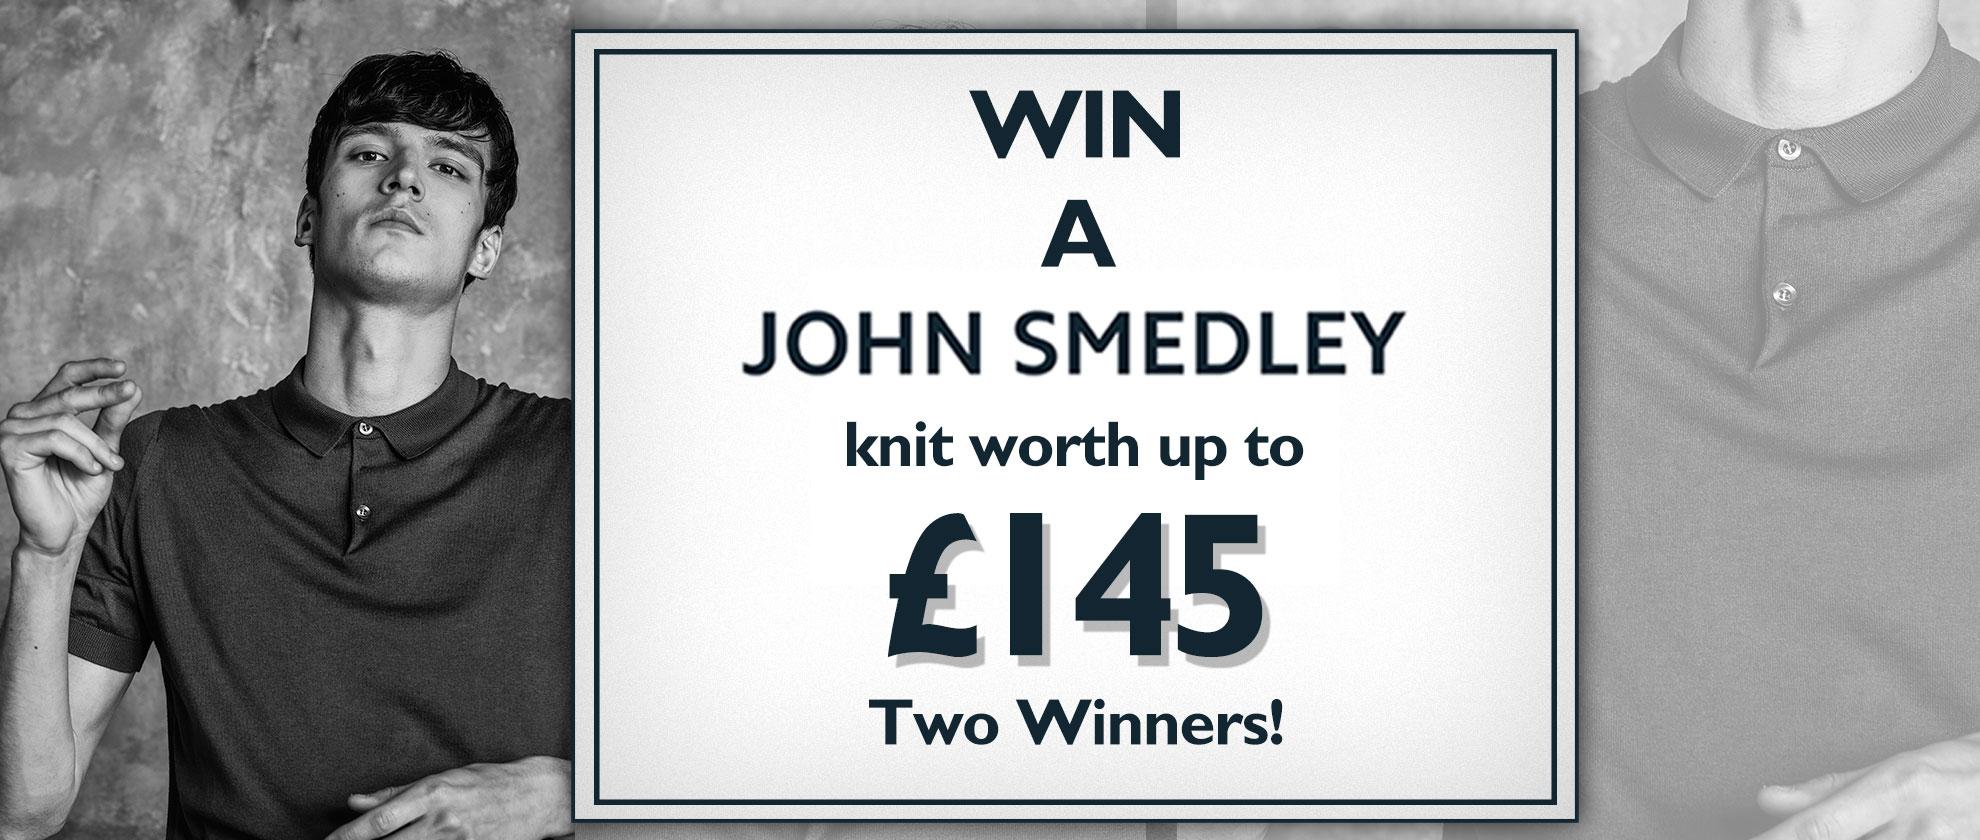 Win a John Smedley Knit Worth £145!